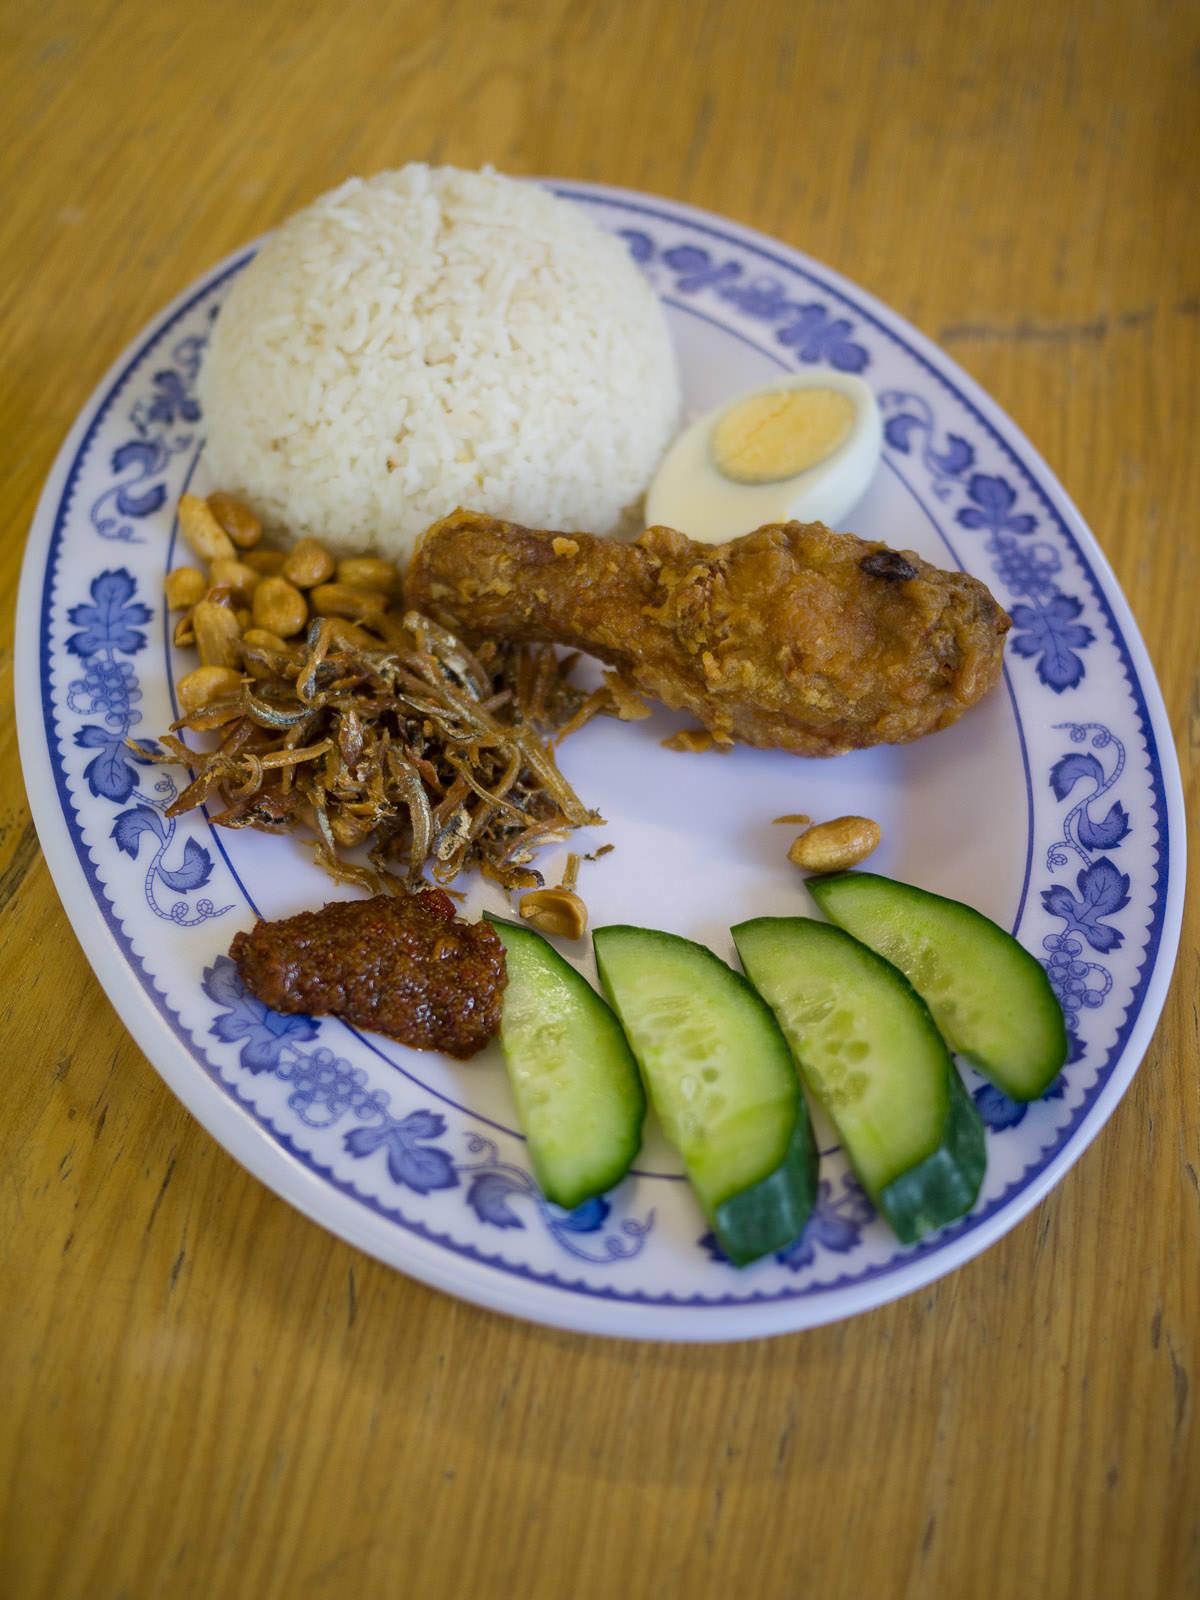 Nasi lemak with ayam goreng (fried chicken)